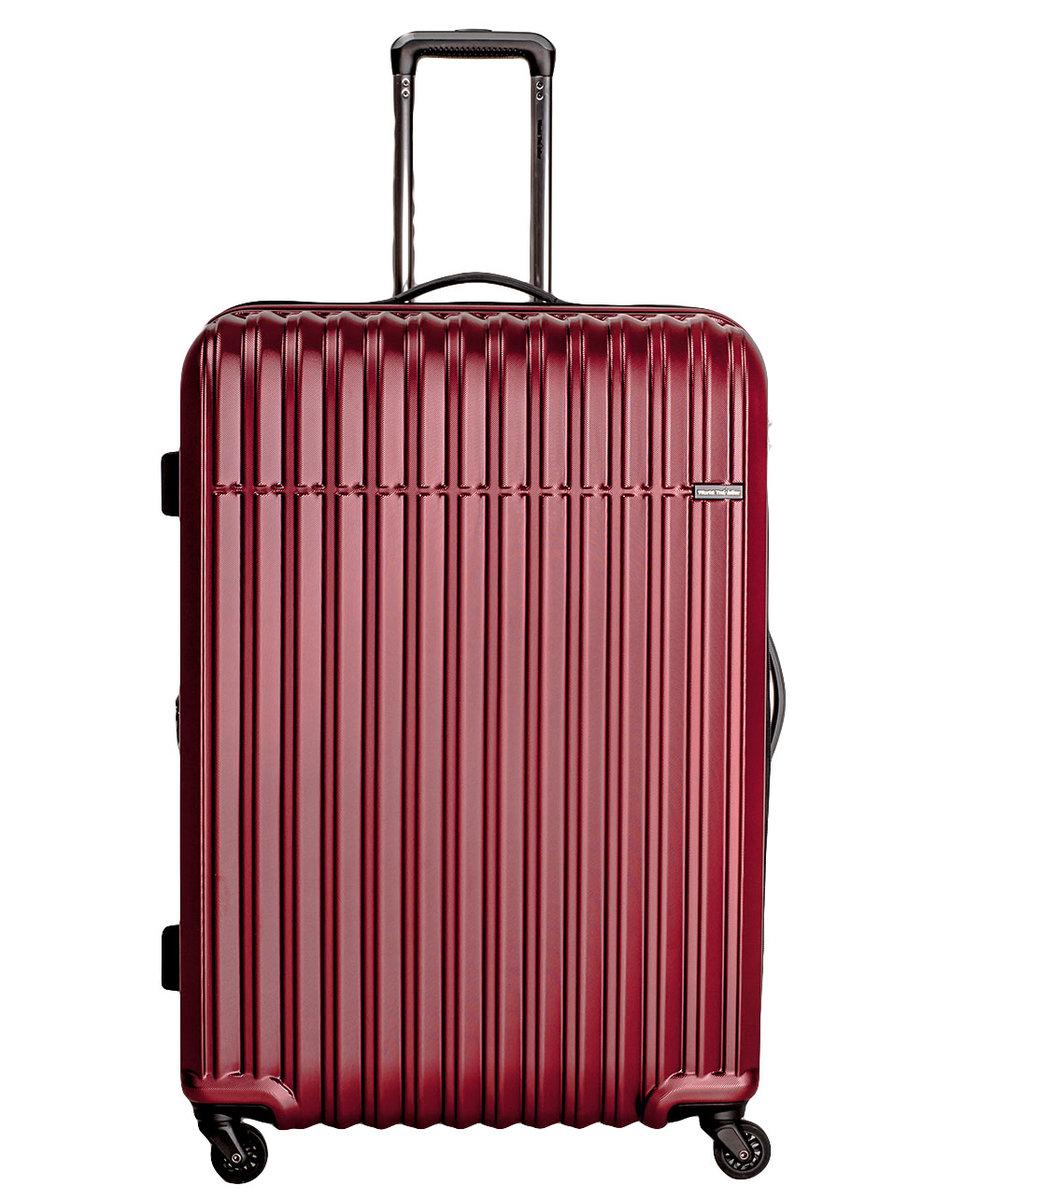 World Traveller - 台北61厘米24吋紅色中號旅行箱- 17T46103-008